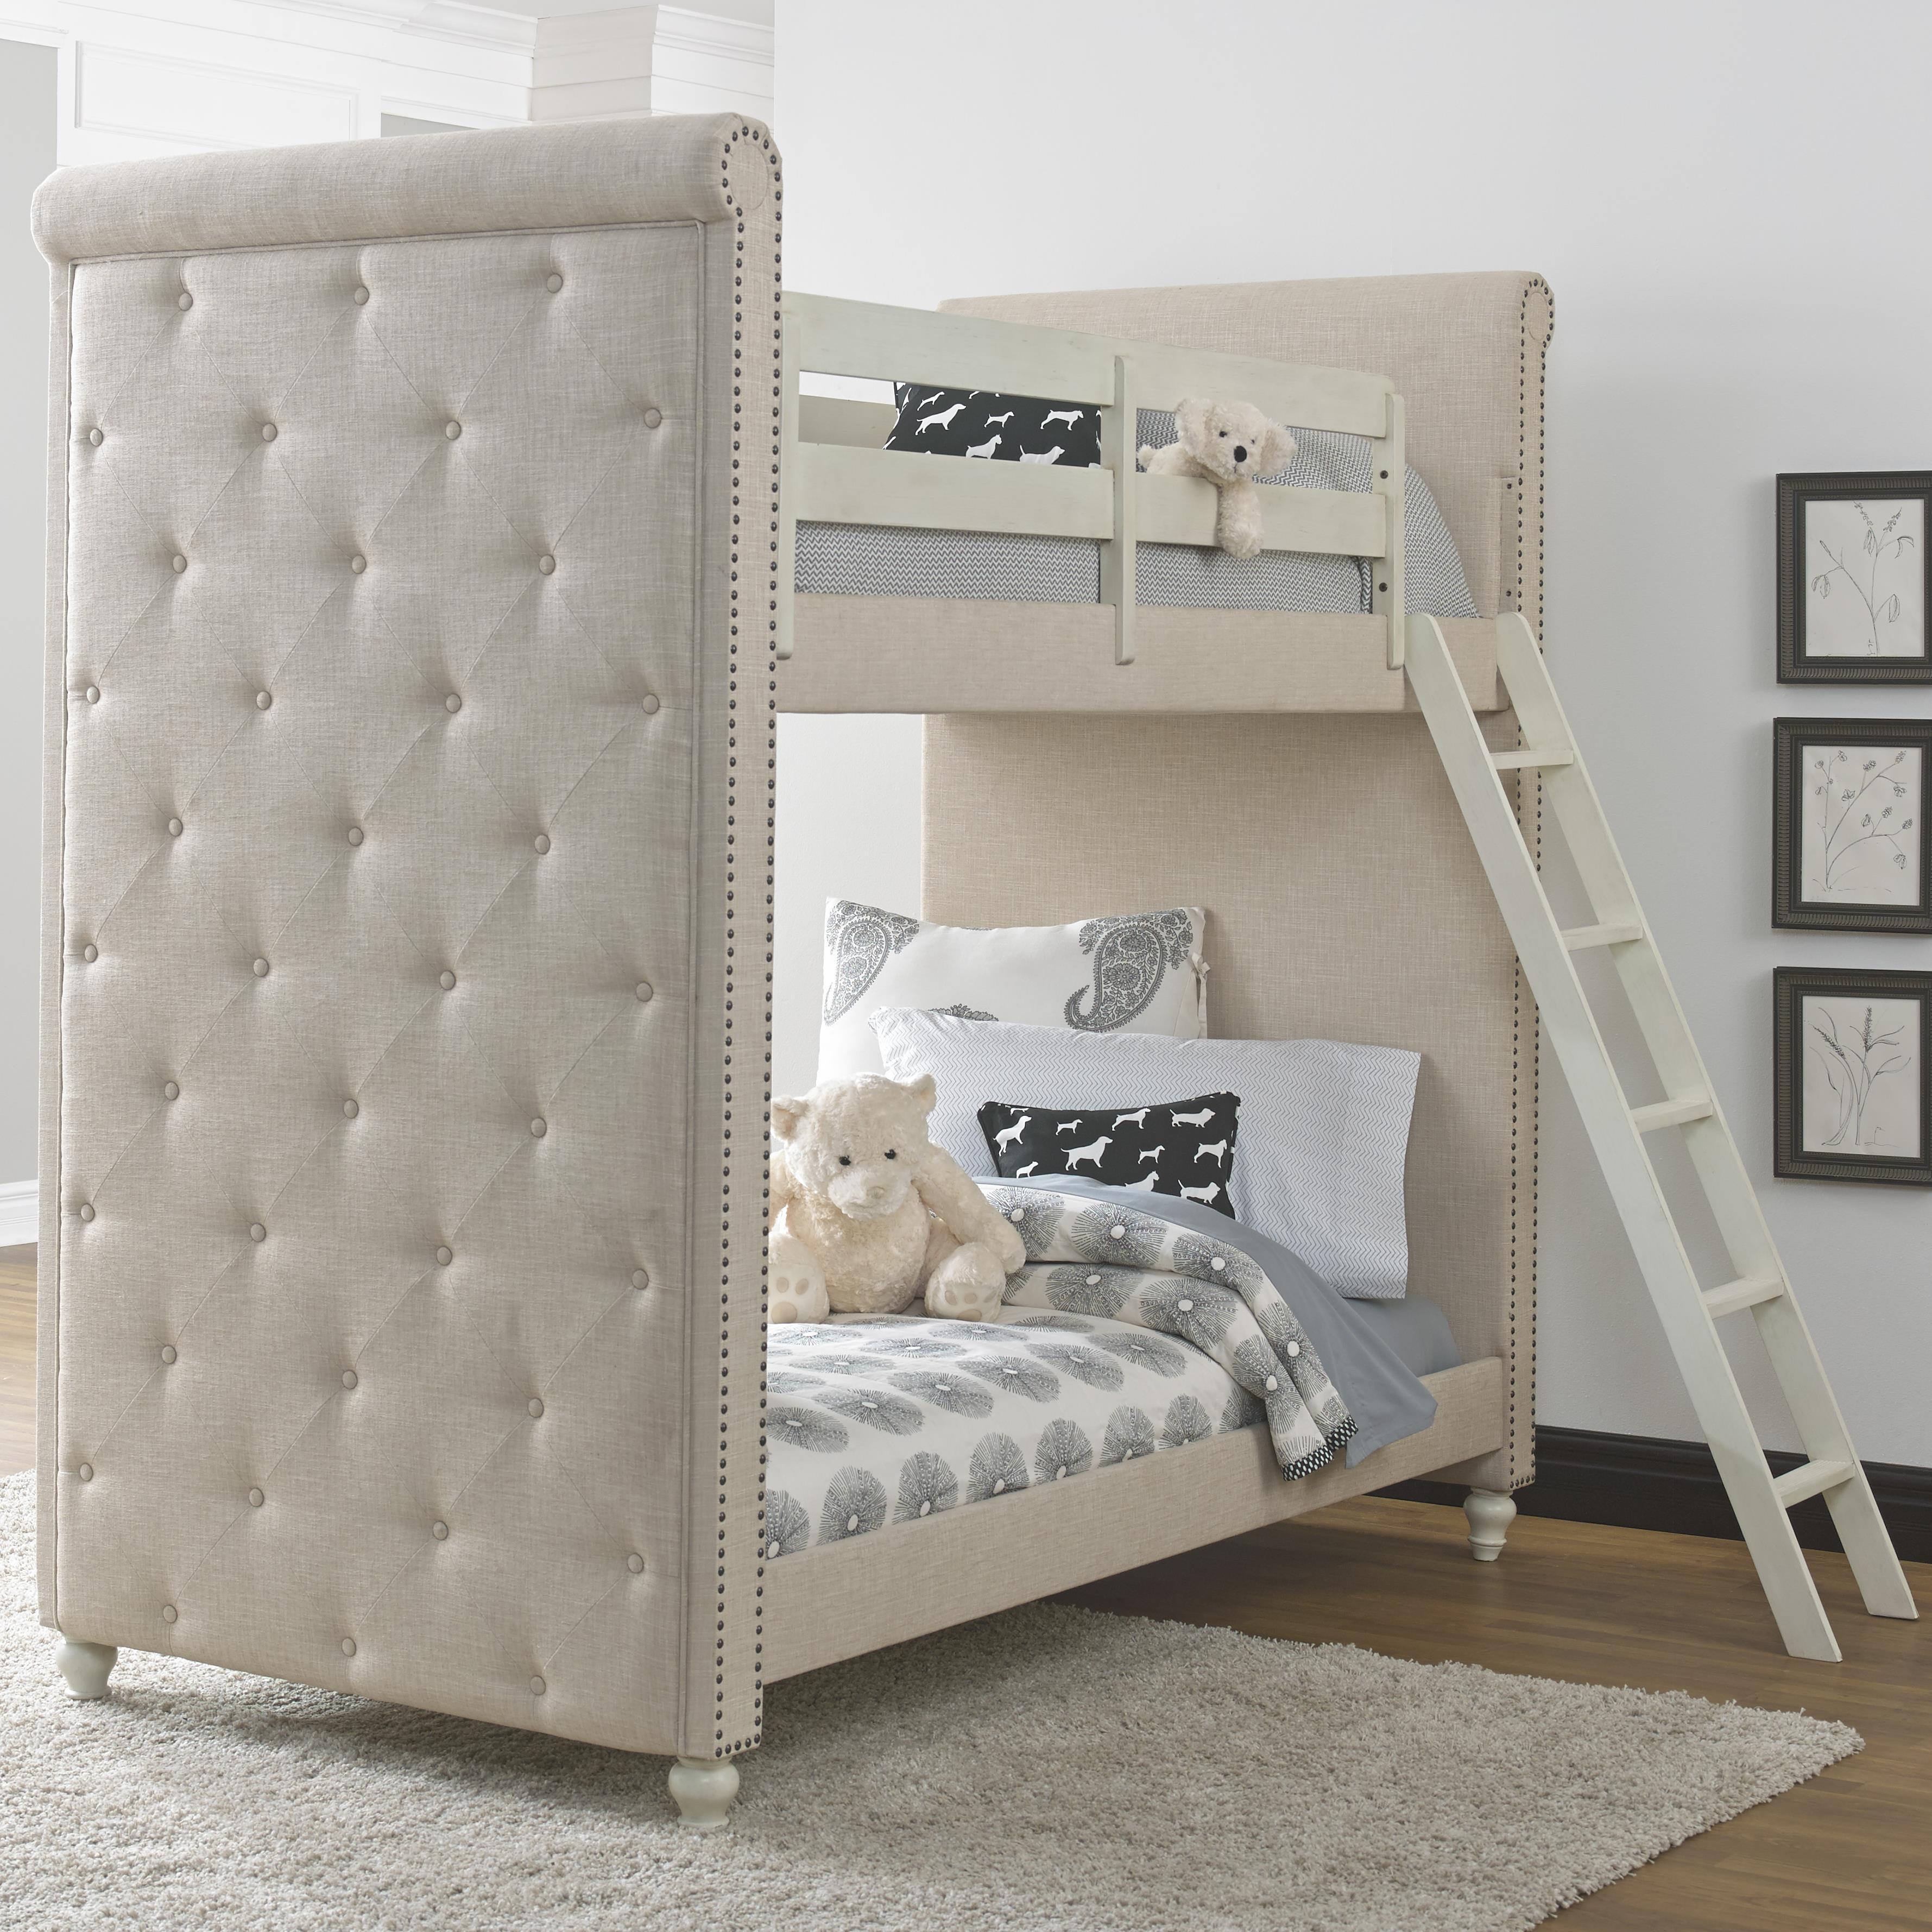 Kidz Gear Everly Twin Bunk Bed - Item Number: 8890-730+731+732+2xSLATR-33